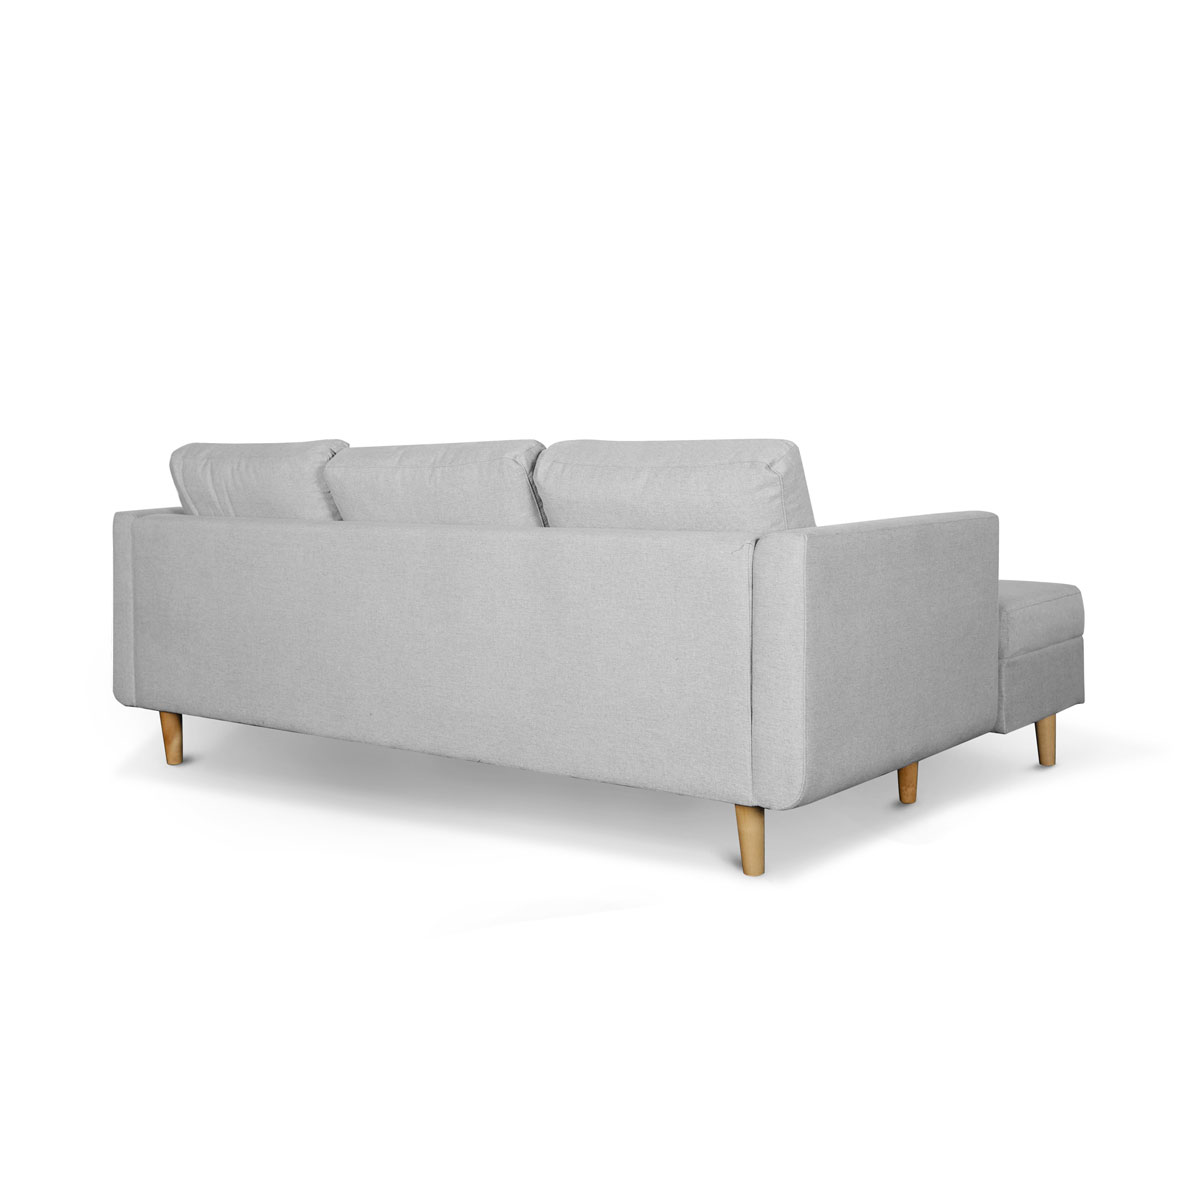 Marcel Stone Grey Right Sectional Sofa Bed Ruma